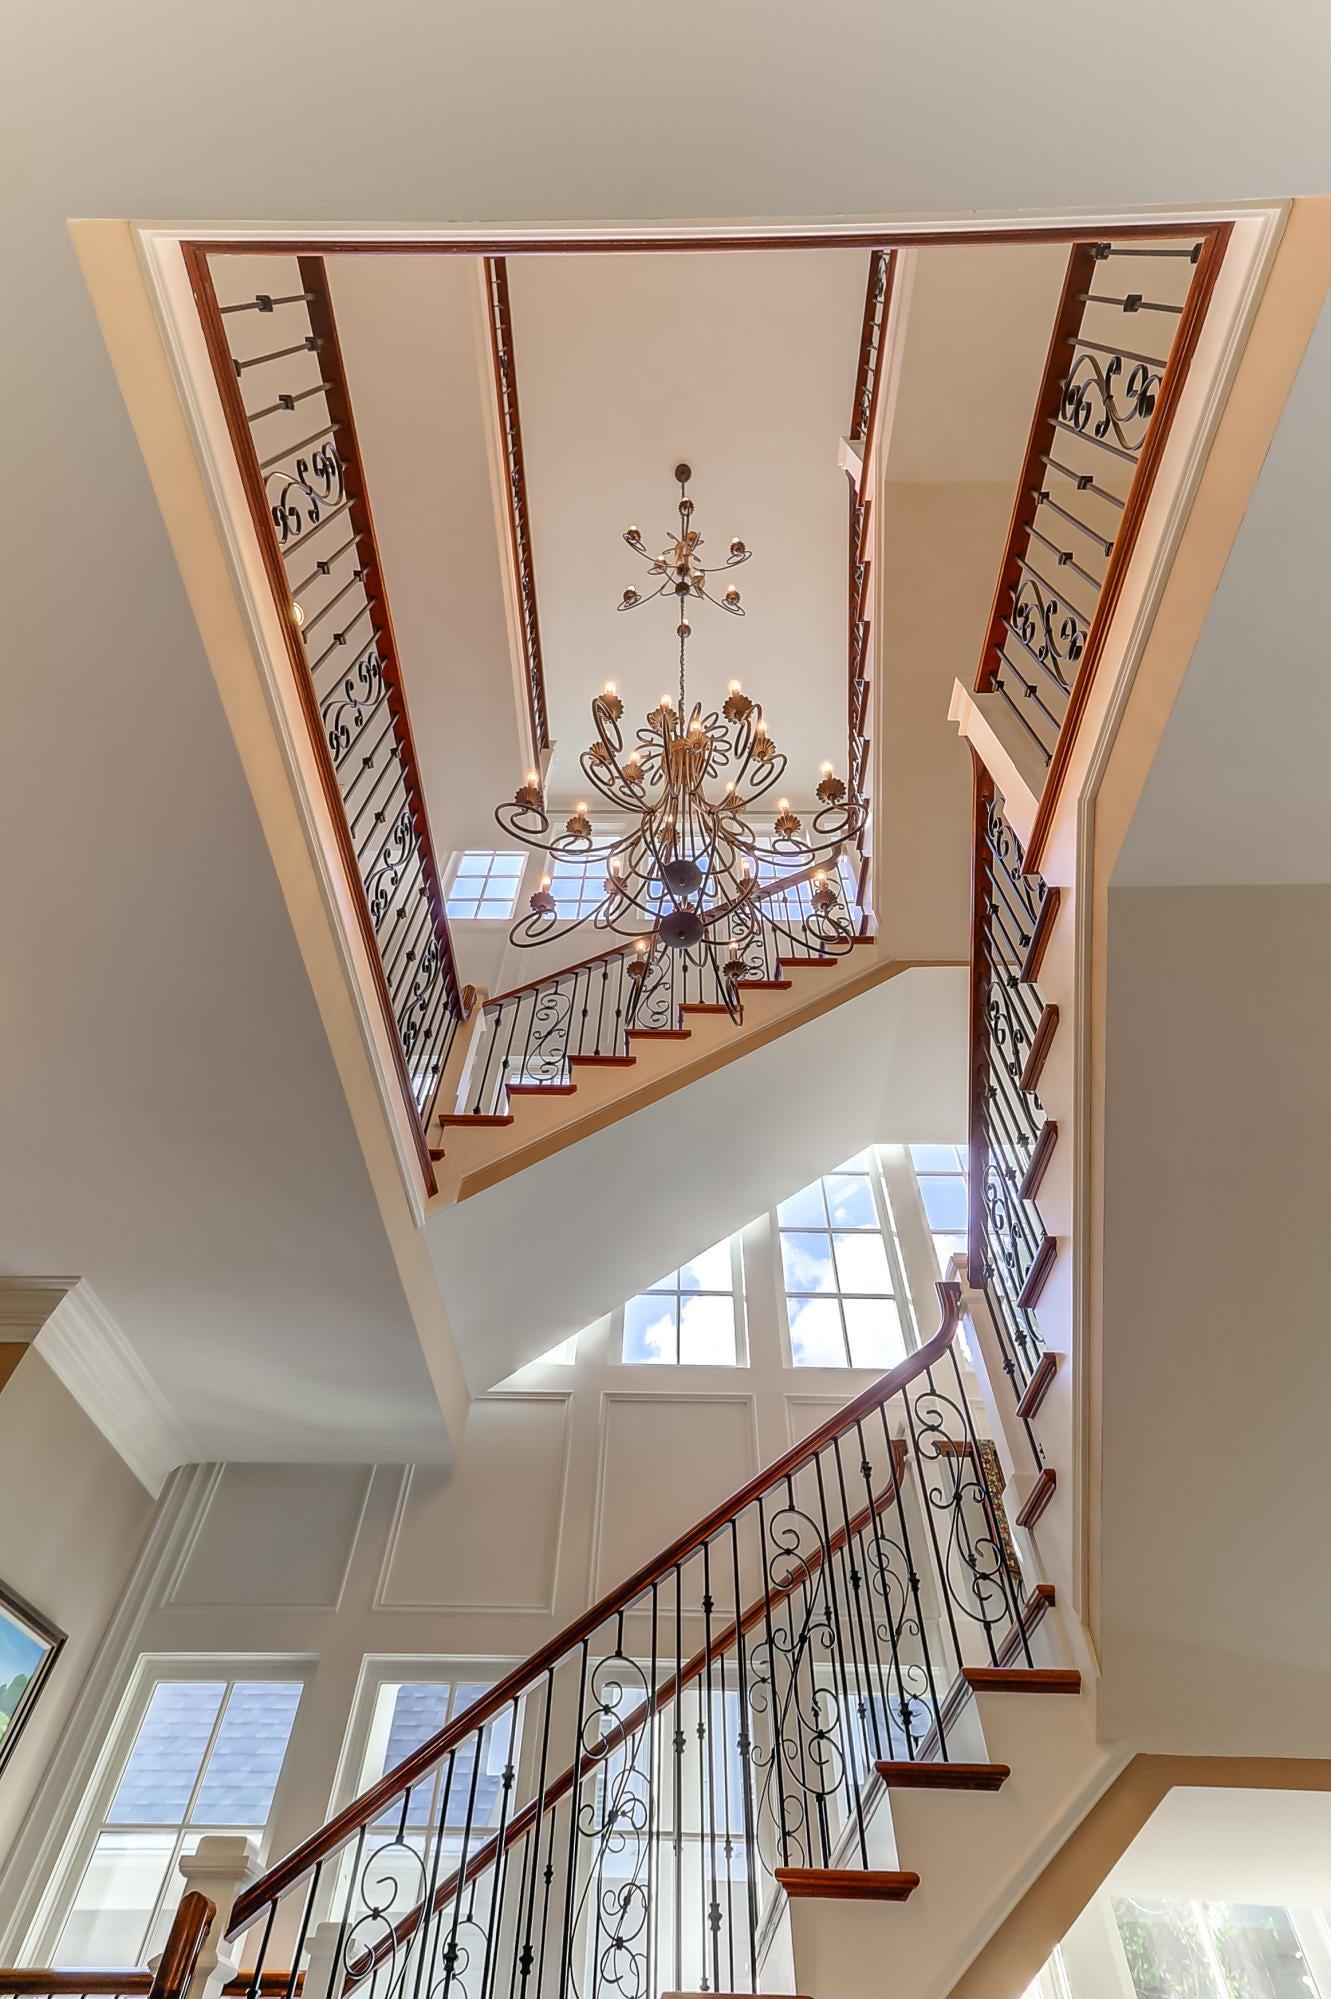 Daniel Island Homes For Sale - 107 Balfour, Charleston, SC - 46